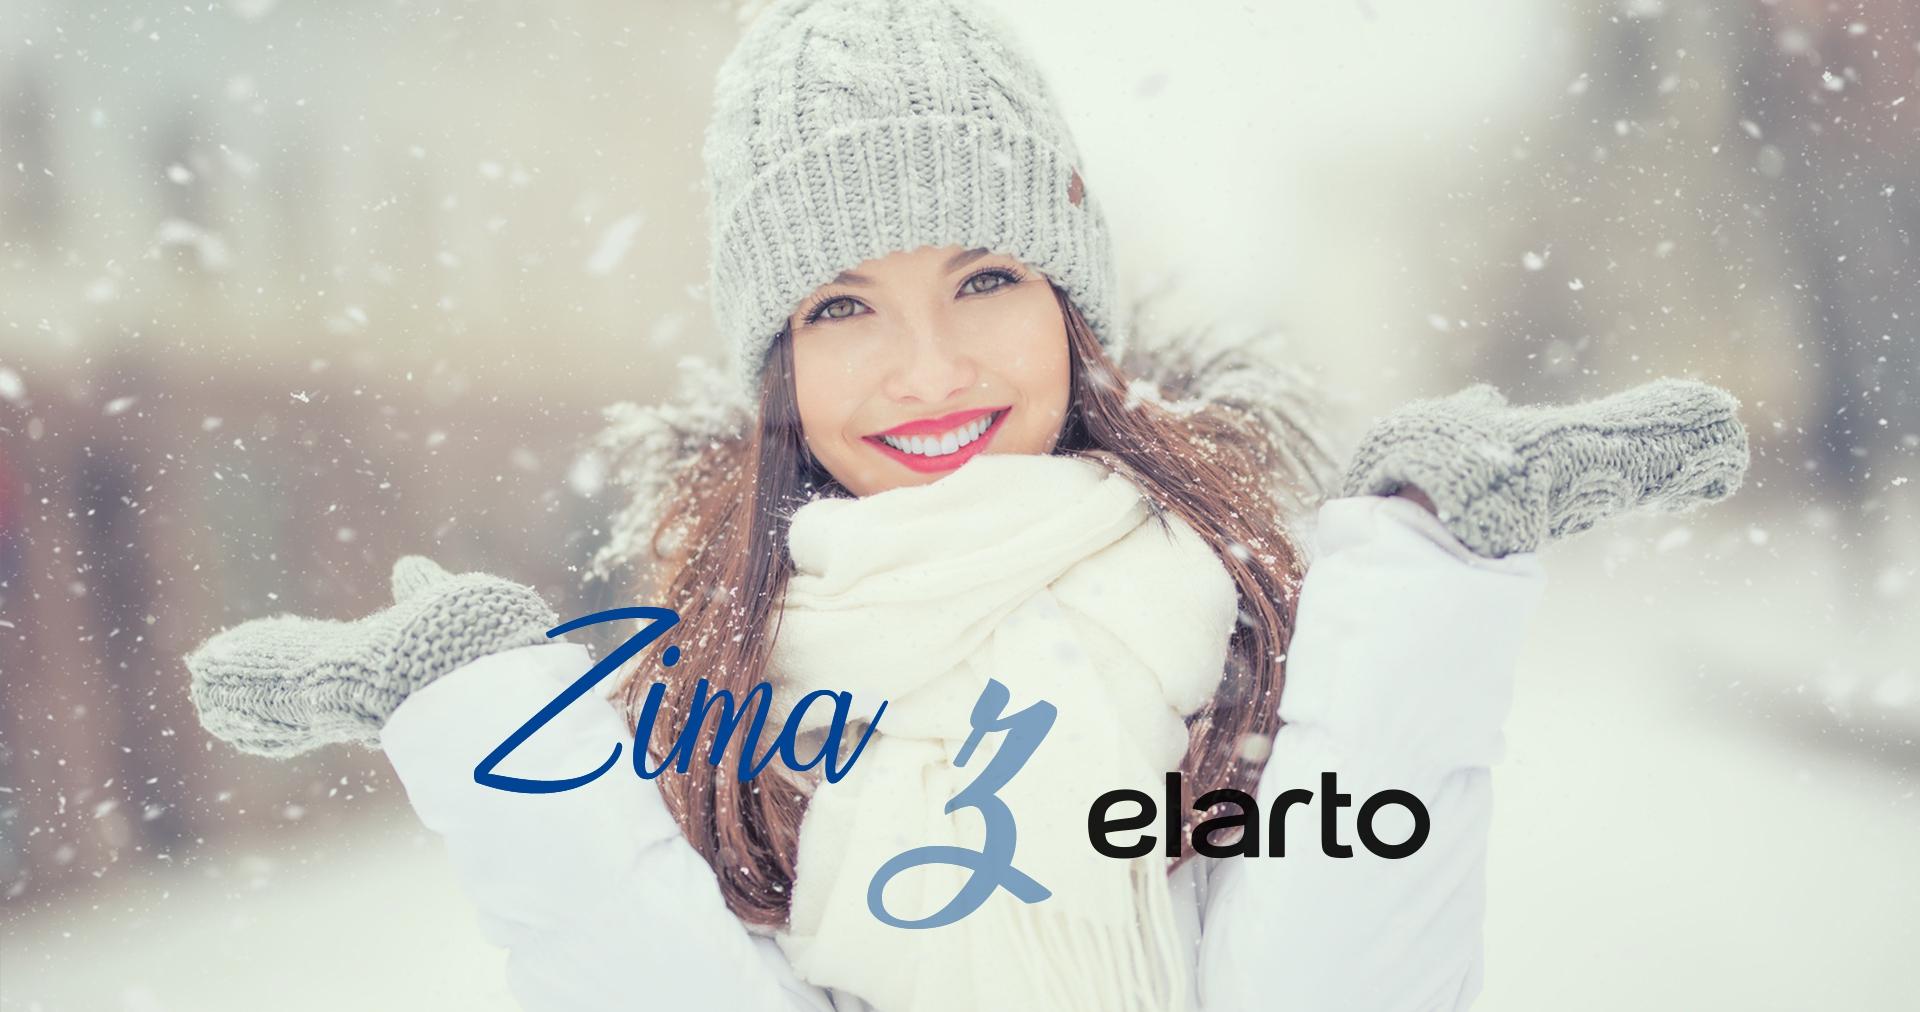 zima_2018